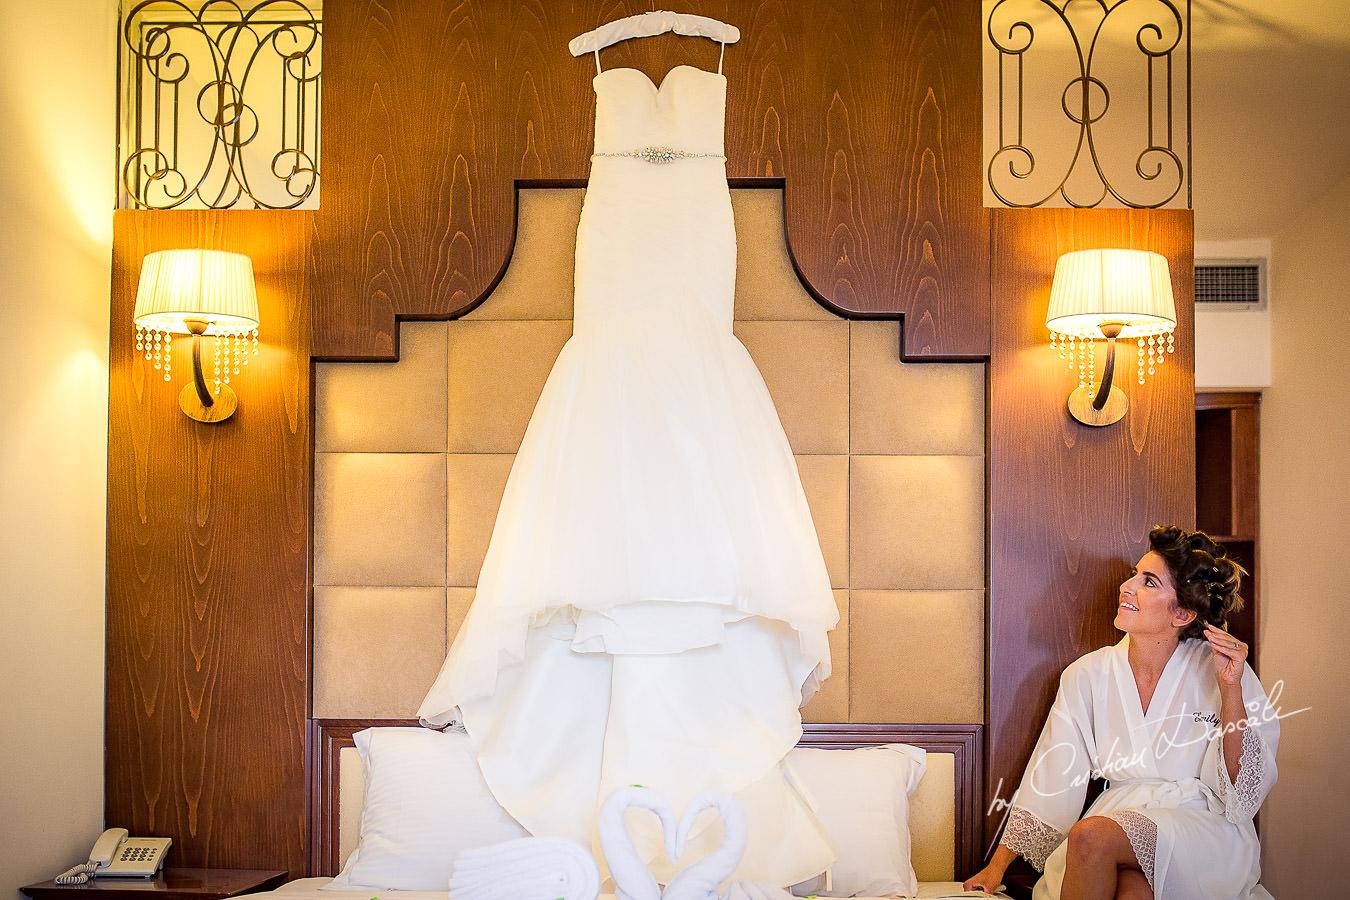 Bride admiring her Wedding Dress at a Beautiful Wedding at Elias Beach Hotel captured by Cyprus Photographer Cristian Dascalu.